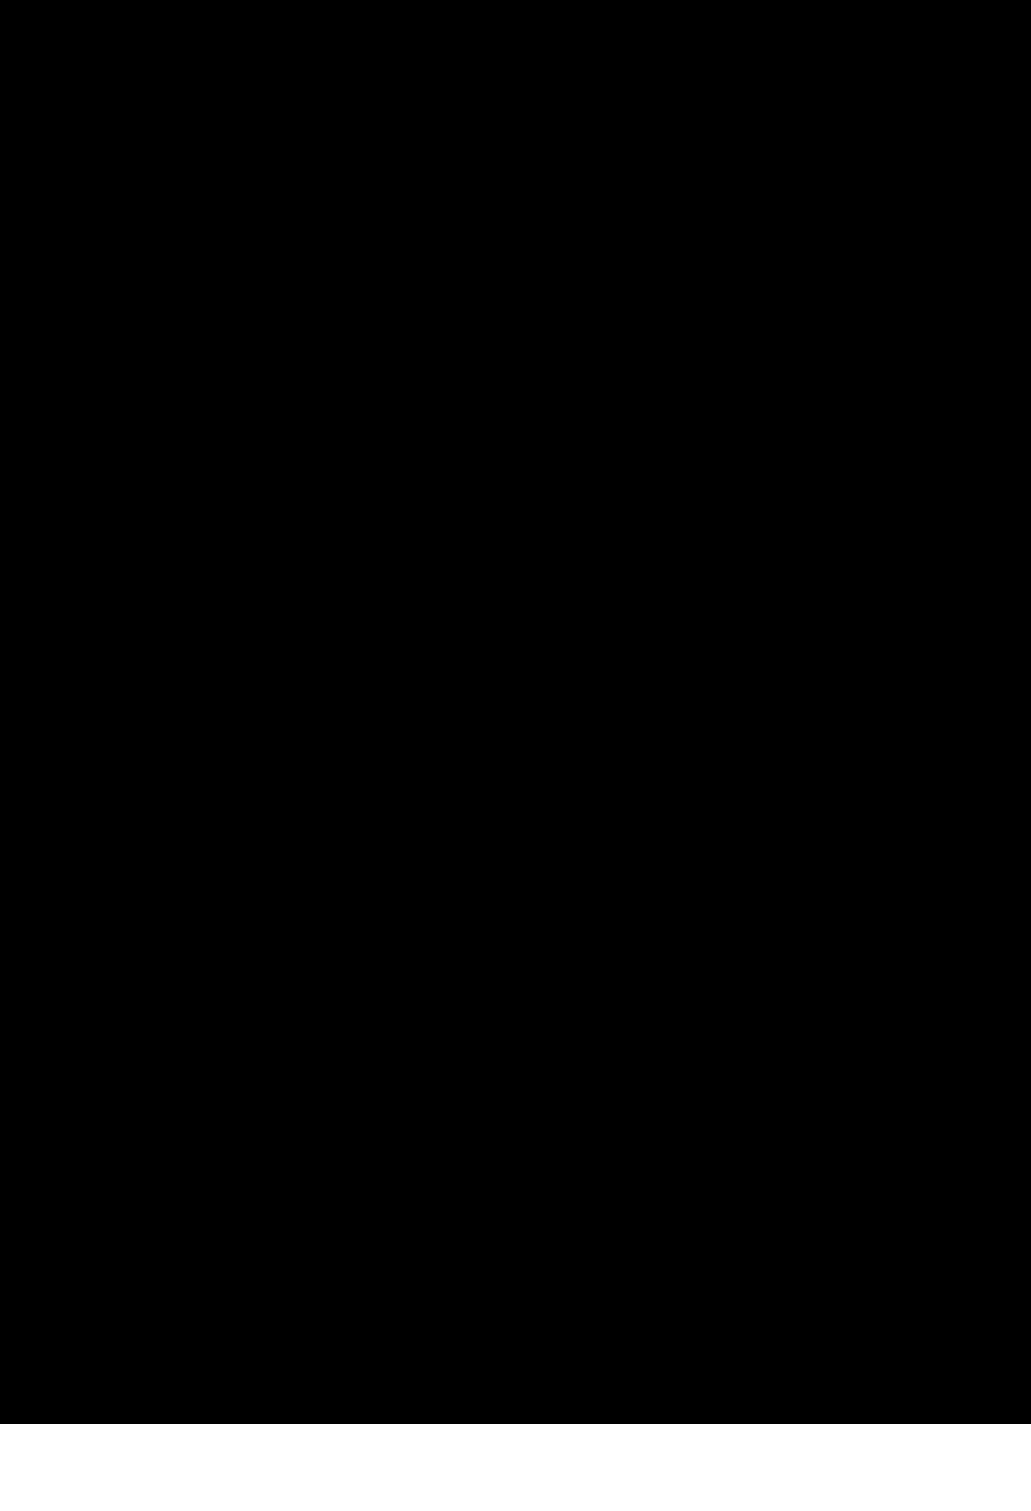 2AC2138A-8F08-4771-AAEC-0F294B386612